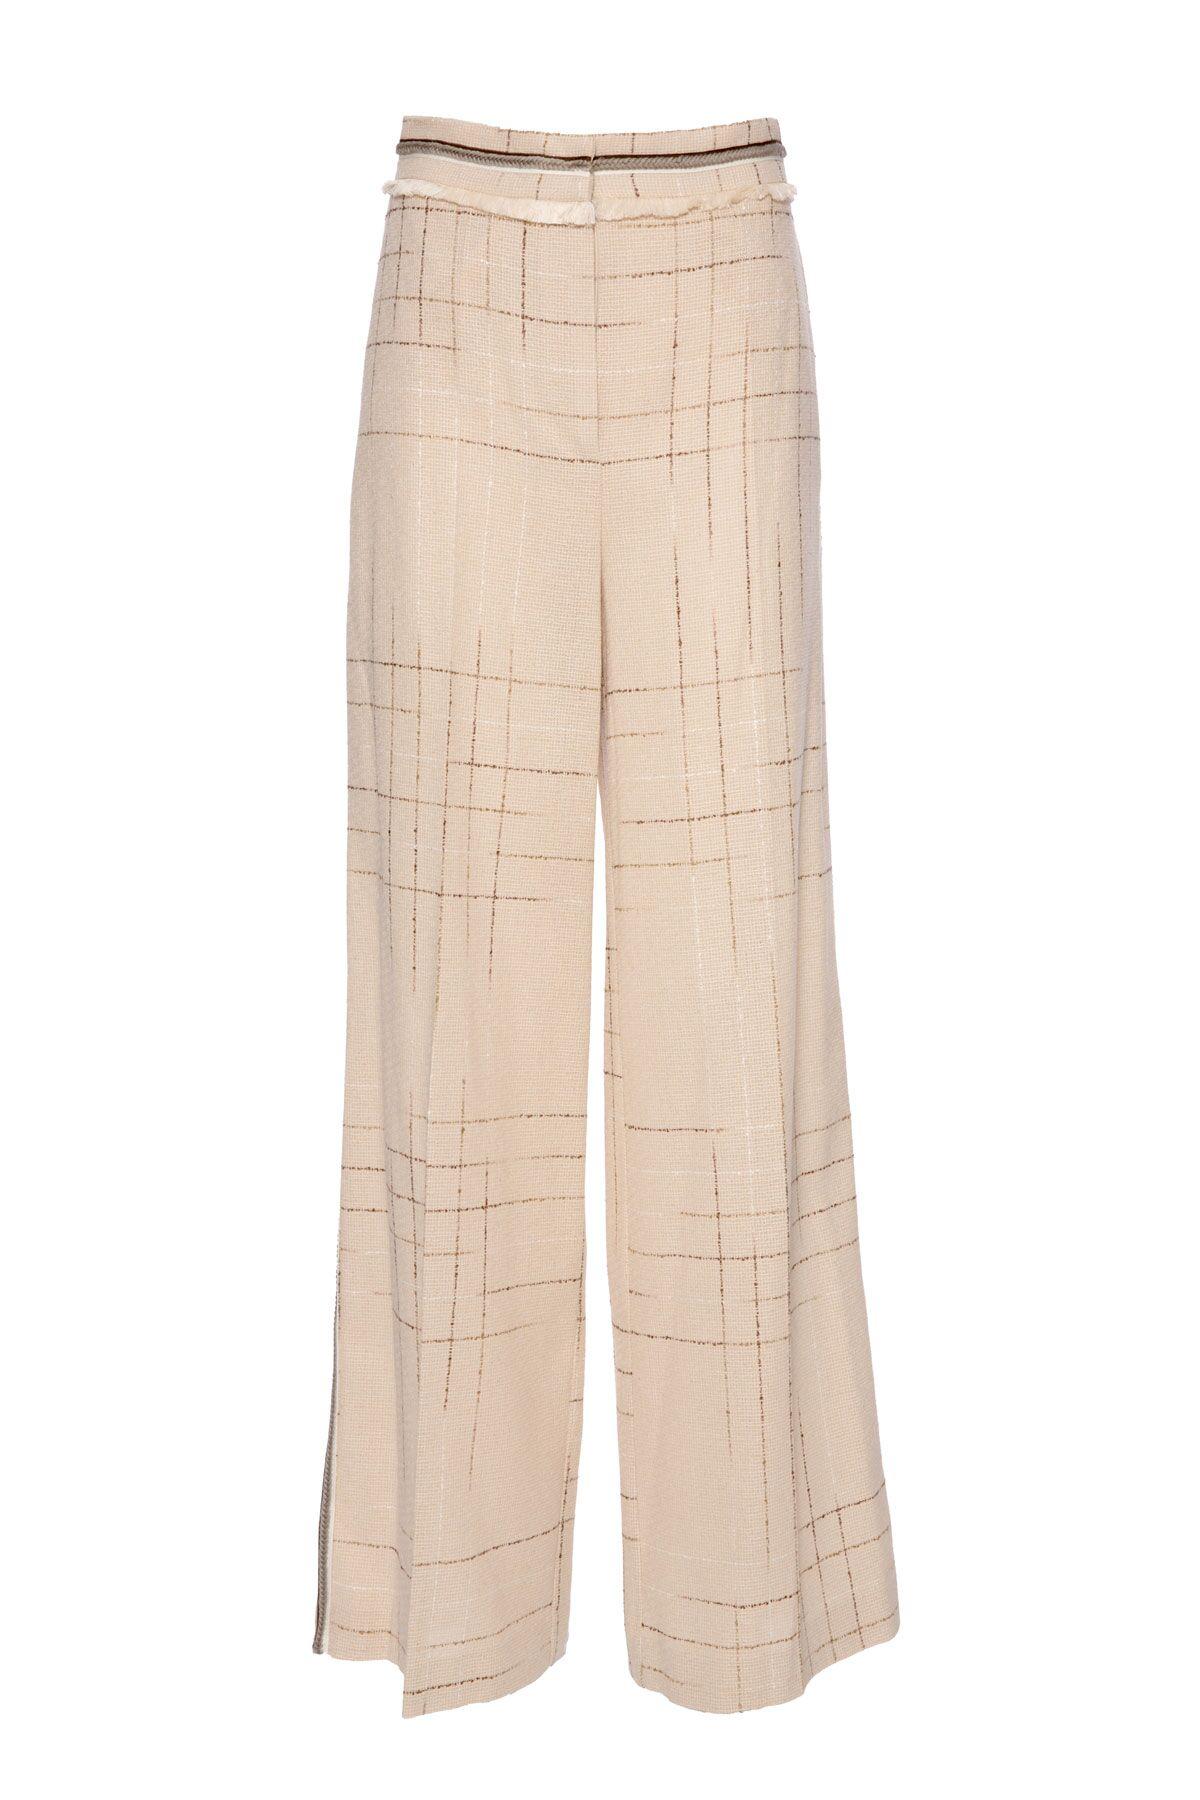 Şerit Detaylı Çizgili Geniş Paça Bej Pantolon